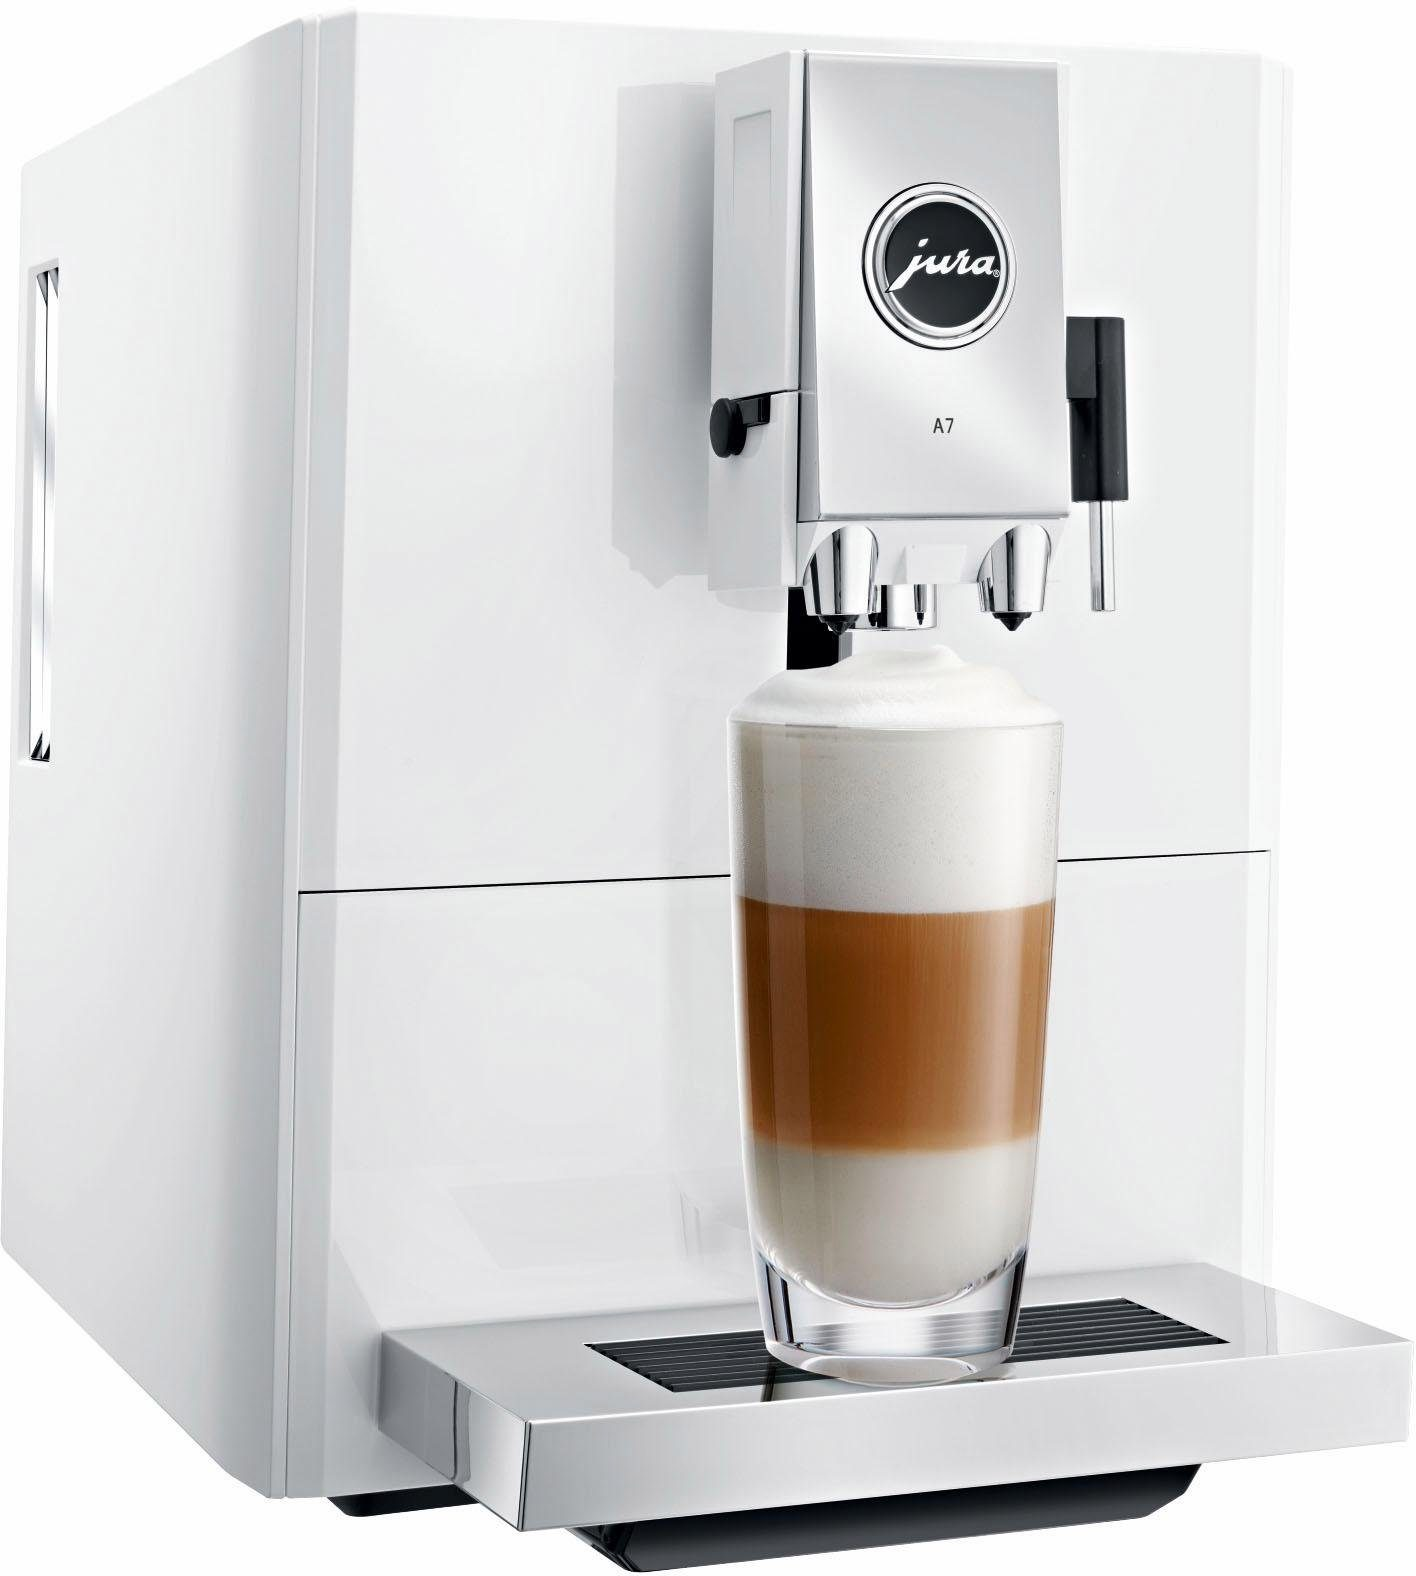 Jura Kaffeevollautomat 15125 A7 Piano White, 1,1l Tank, Kegelmahlwerk